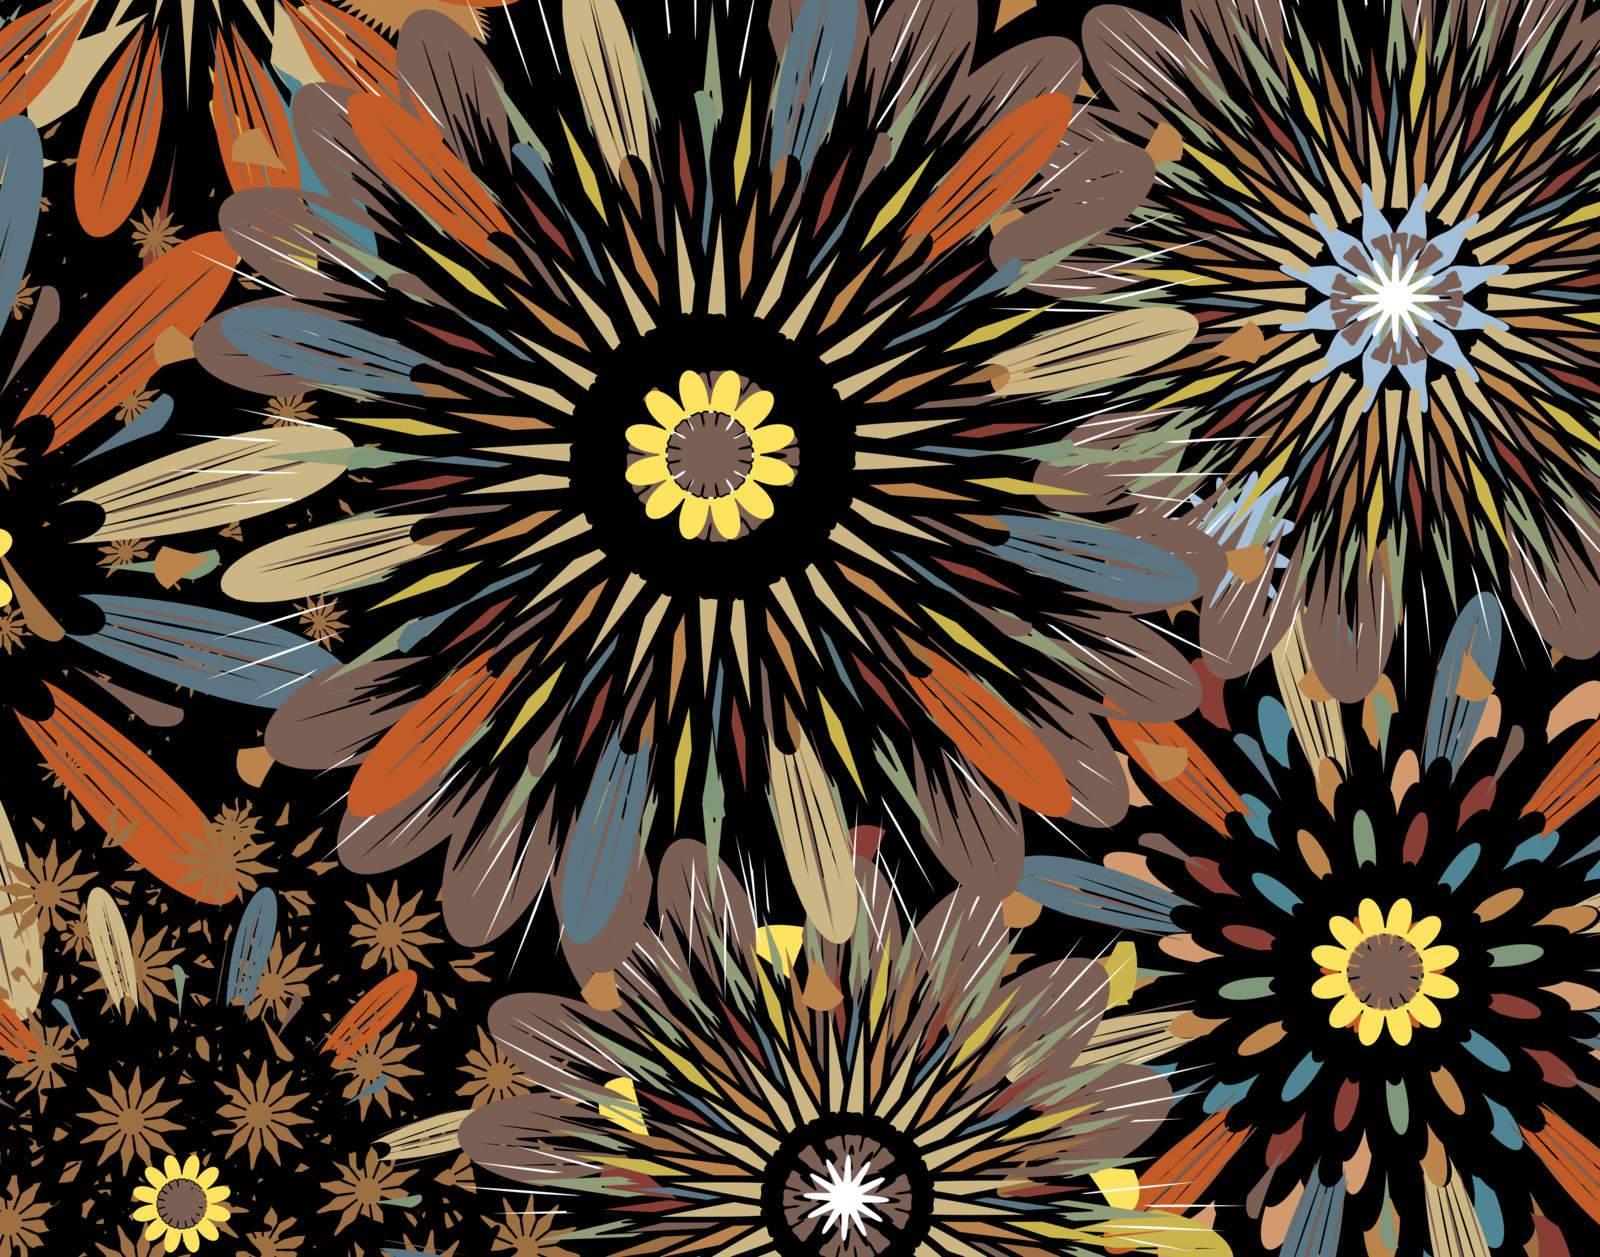 Editable vector background illustration of generic flowers